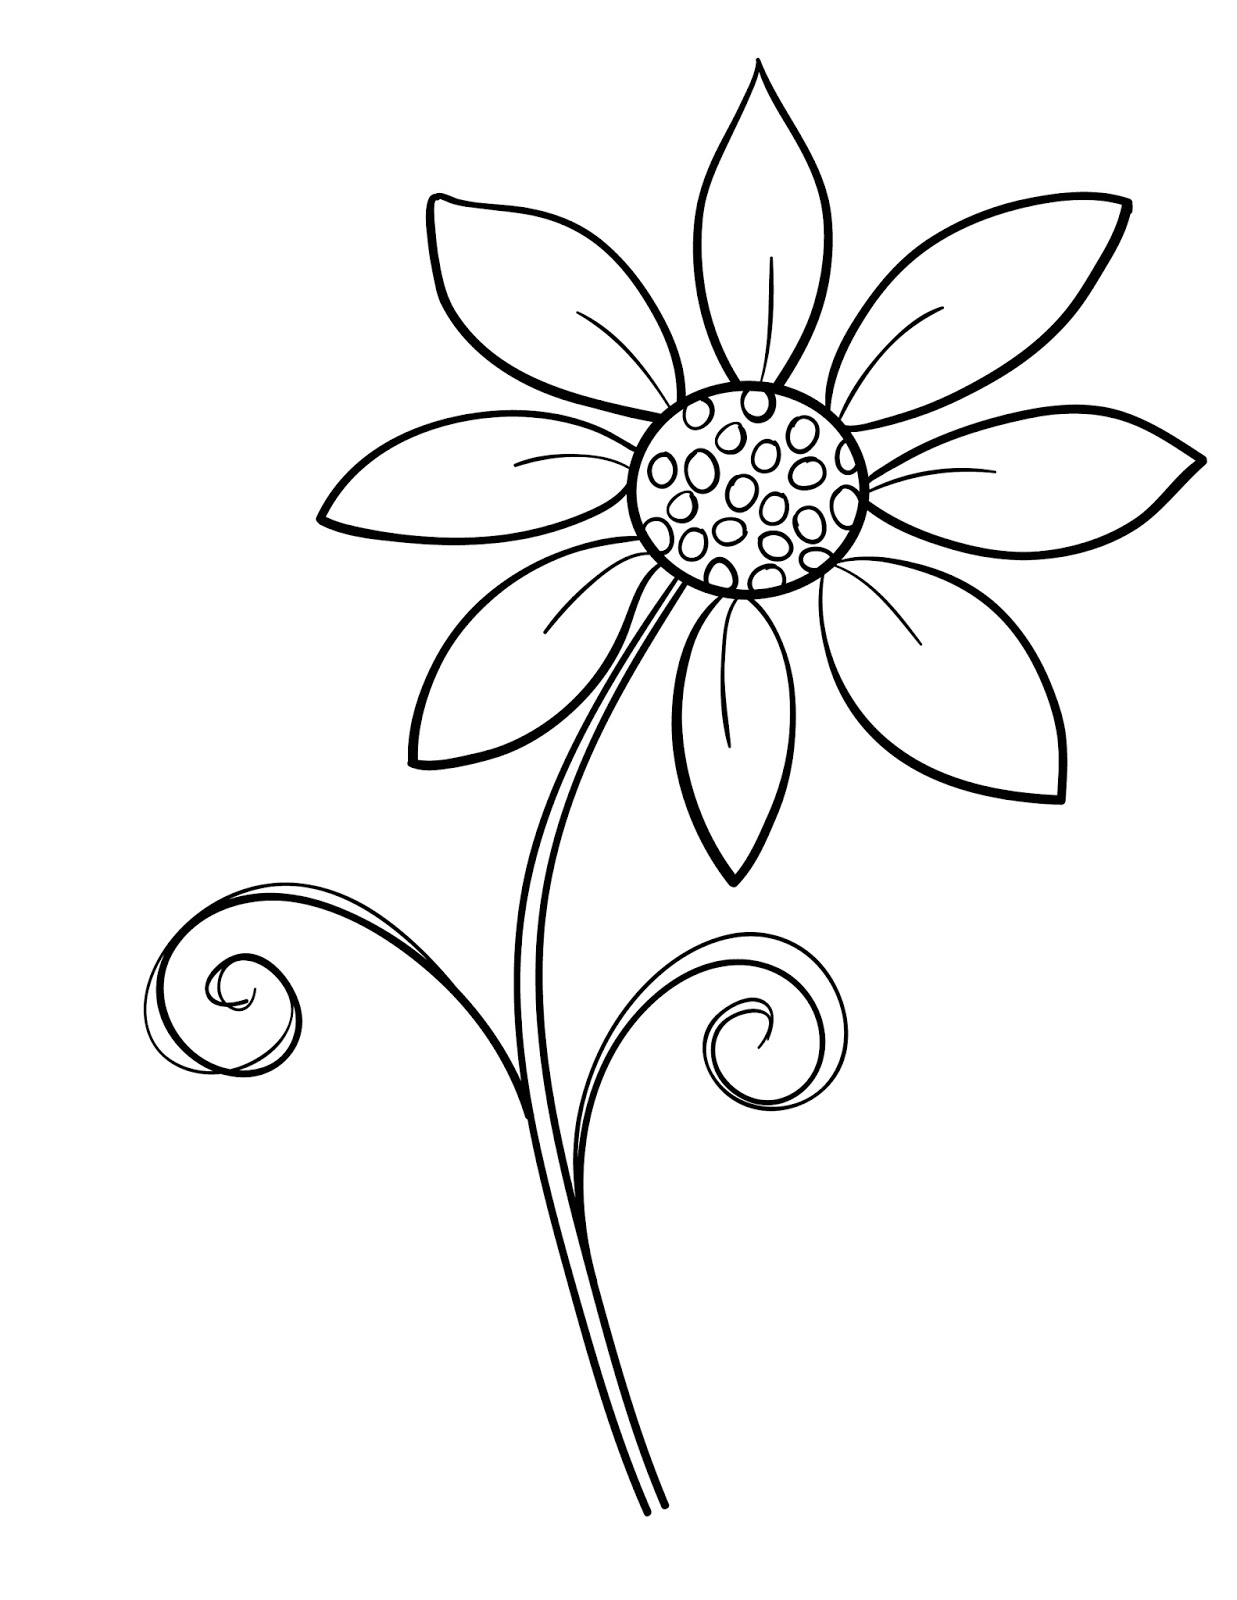 http://2.bp.blogspot.com/-amV2GdIza3M/Uz7iyseOwWI/AAAAAAAACKk/Vl4Z0g-z_g8/s1600/DawnMoore_LostInPaperScraps_FlowerwithSwirls1.jpg